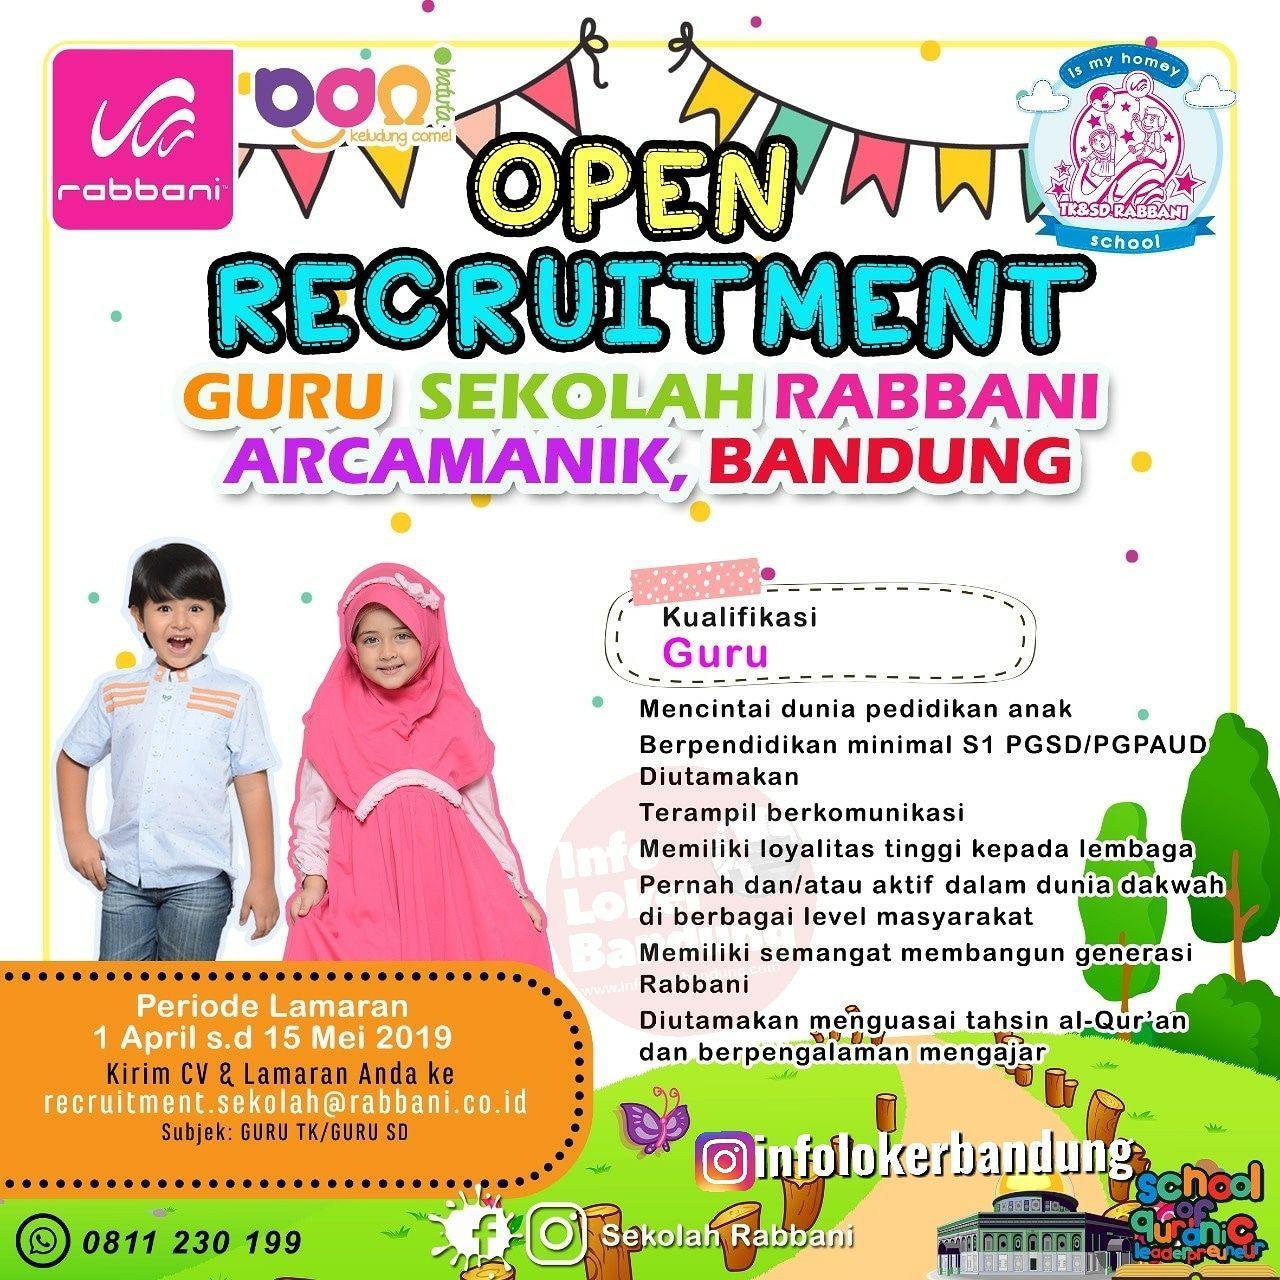 Lowongan Kerja Guru Sekolah Rabbani Arcamanik Bandung April 2019